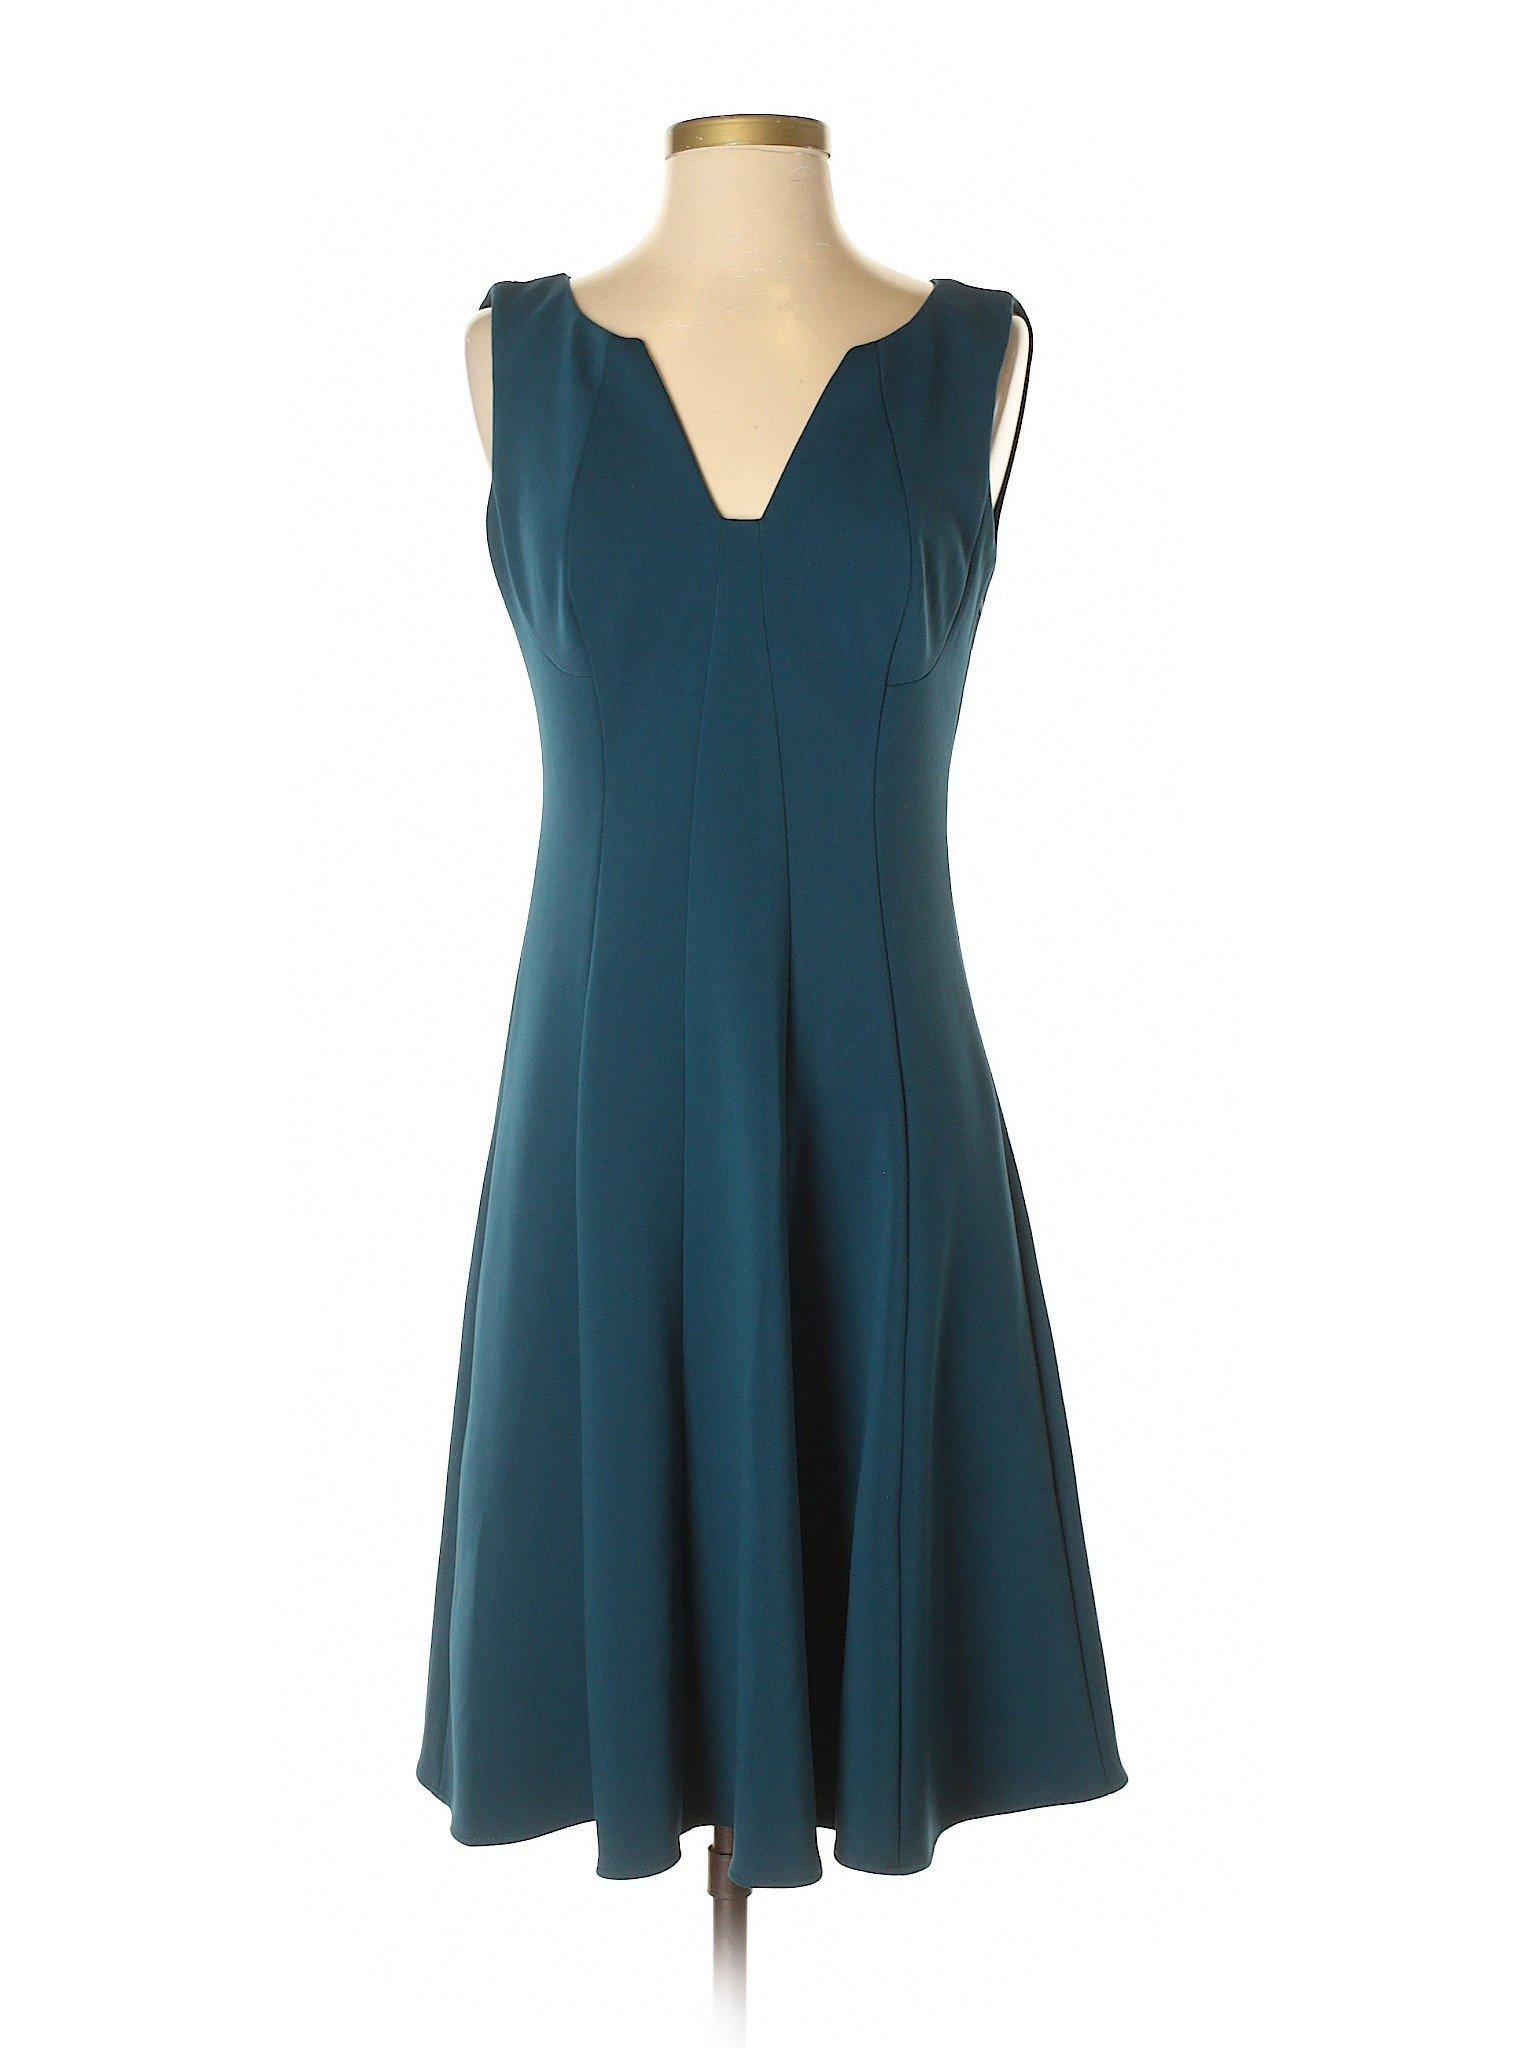 Tahari Casual Boutique Dress T winter YWqHggE4Rx